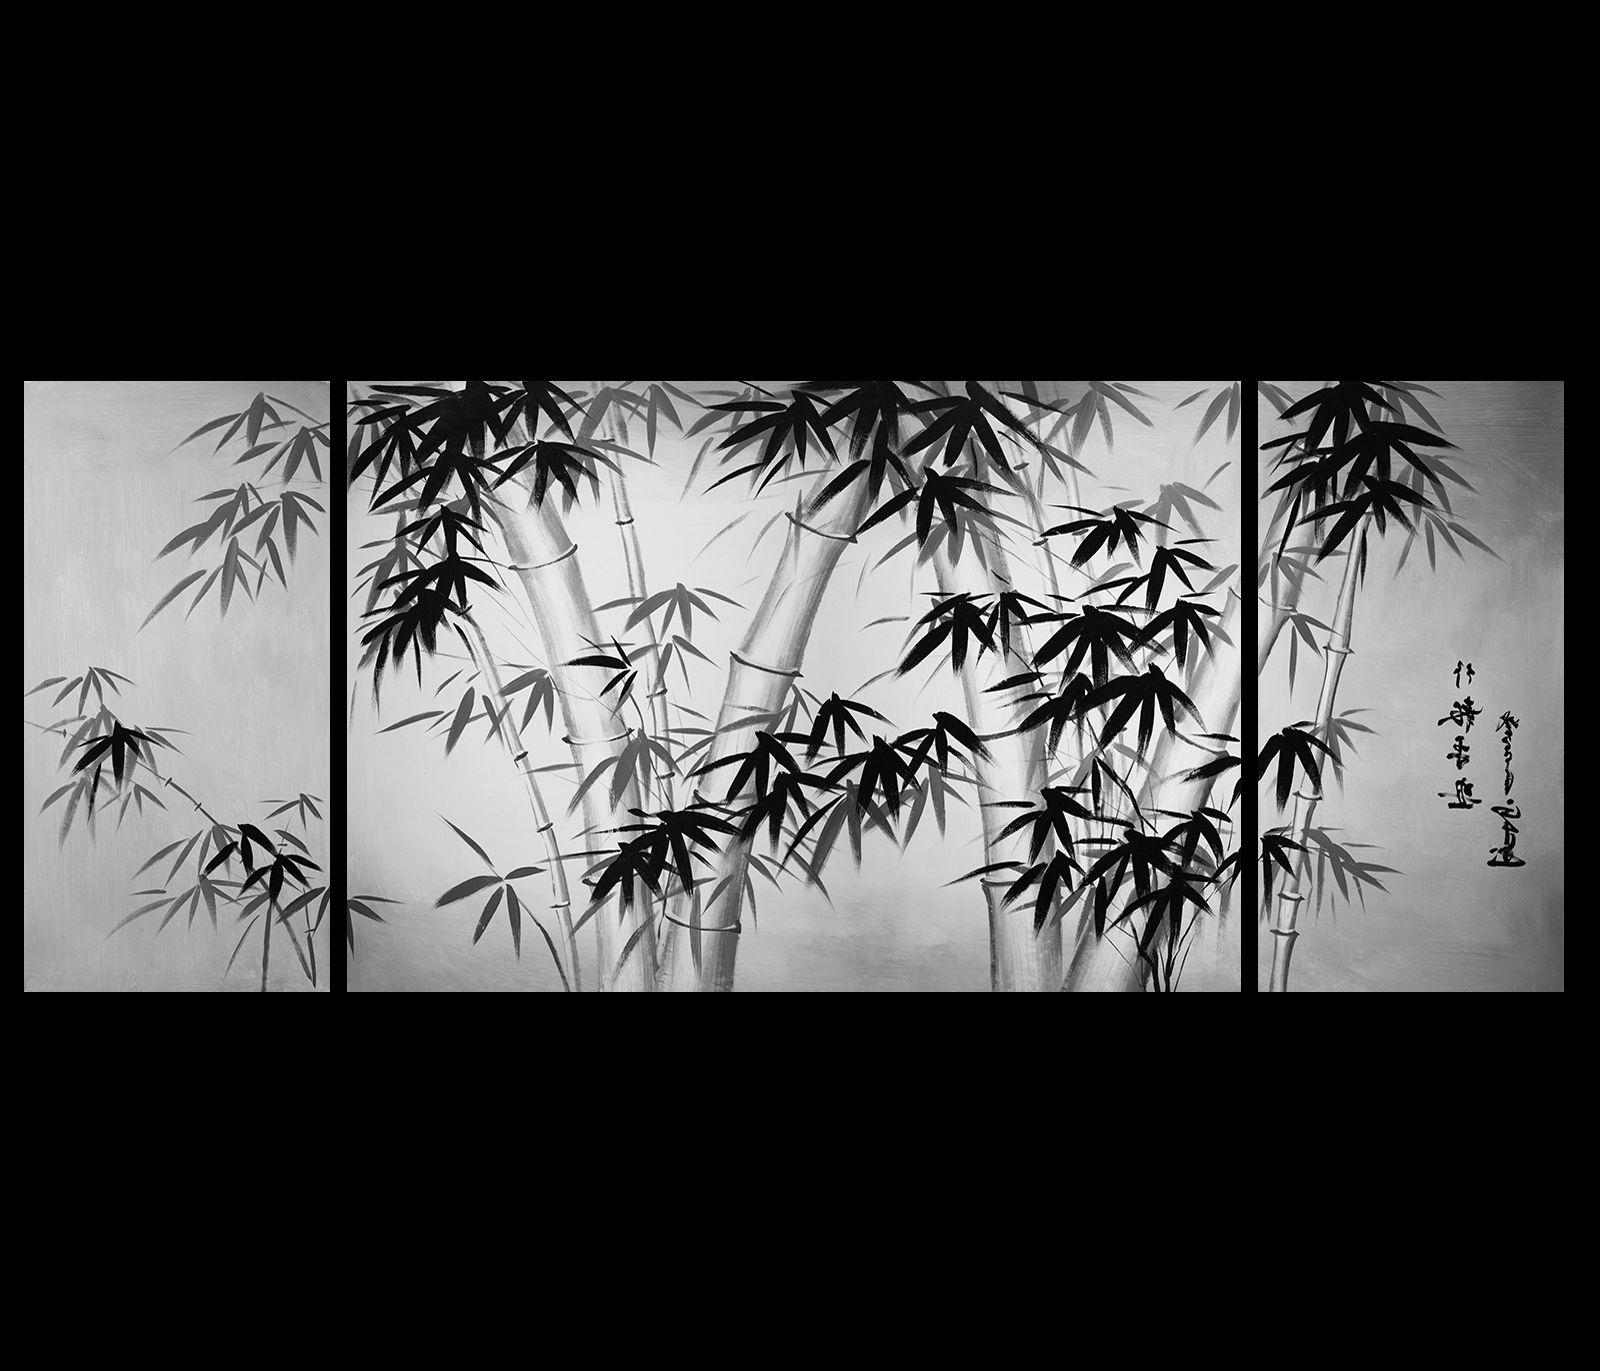 Popular Bamboo Painting Canvas Art Asian Bamboo Art Modern Wall Art Decor Inside Wall Art Paintings (View 7 of 15)